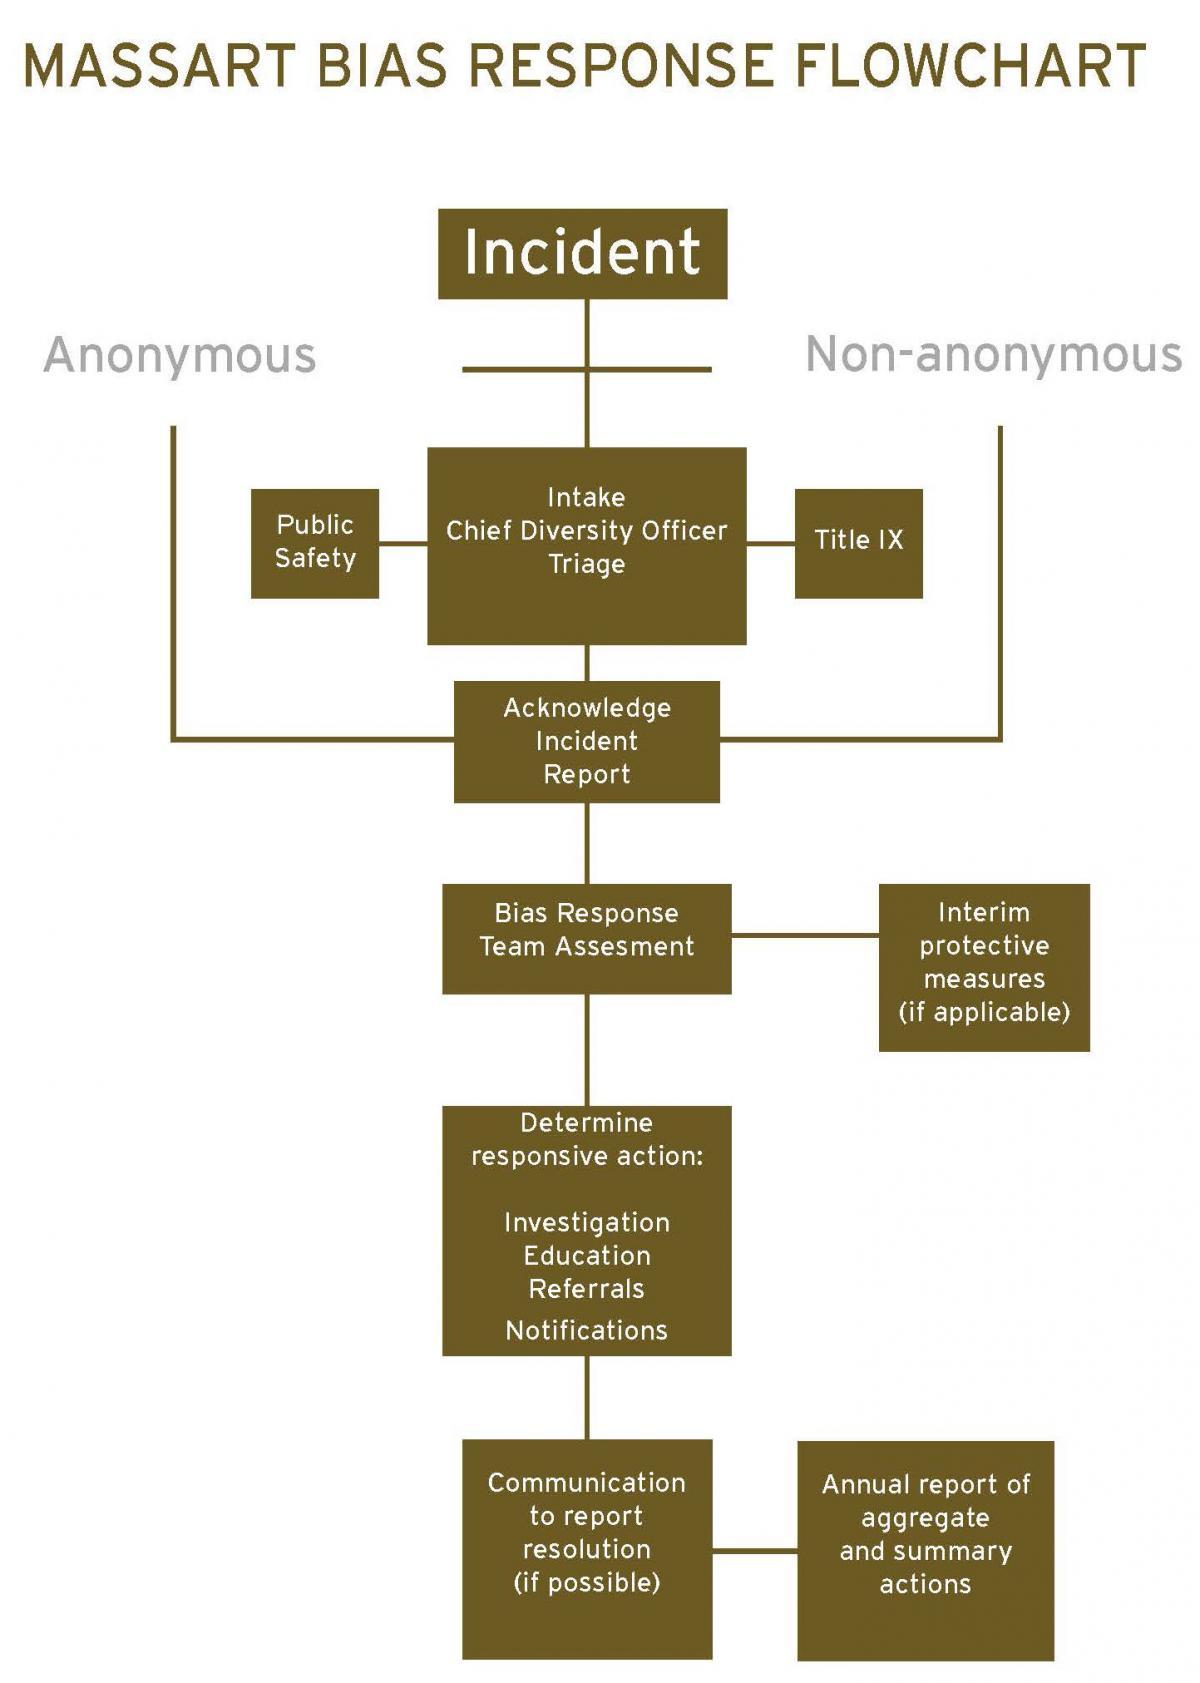 Bias Response Flow Chart